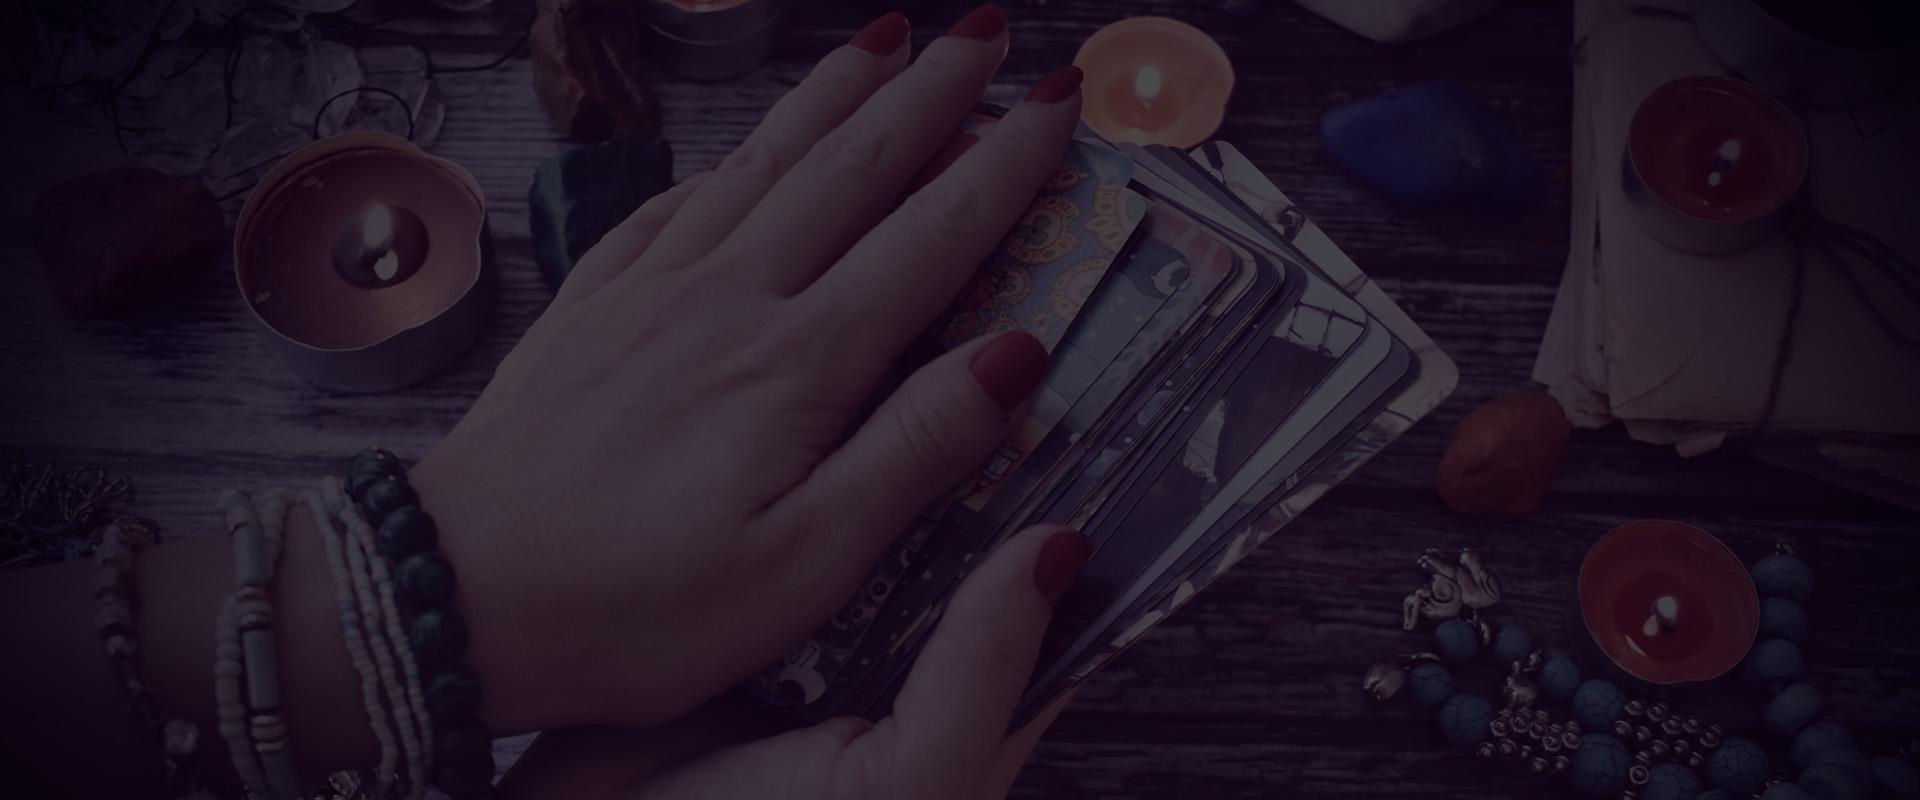 Choosing a tarot card